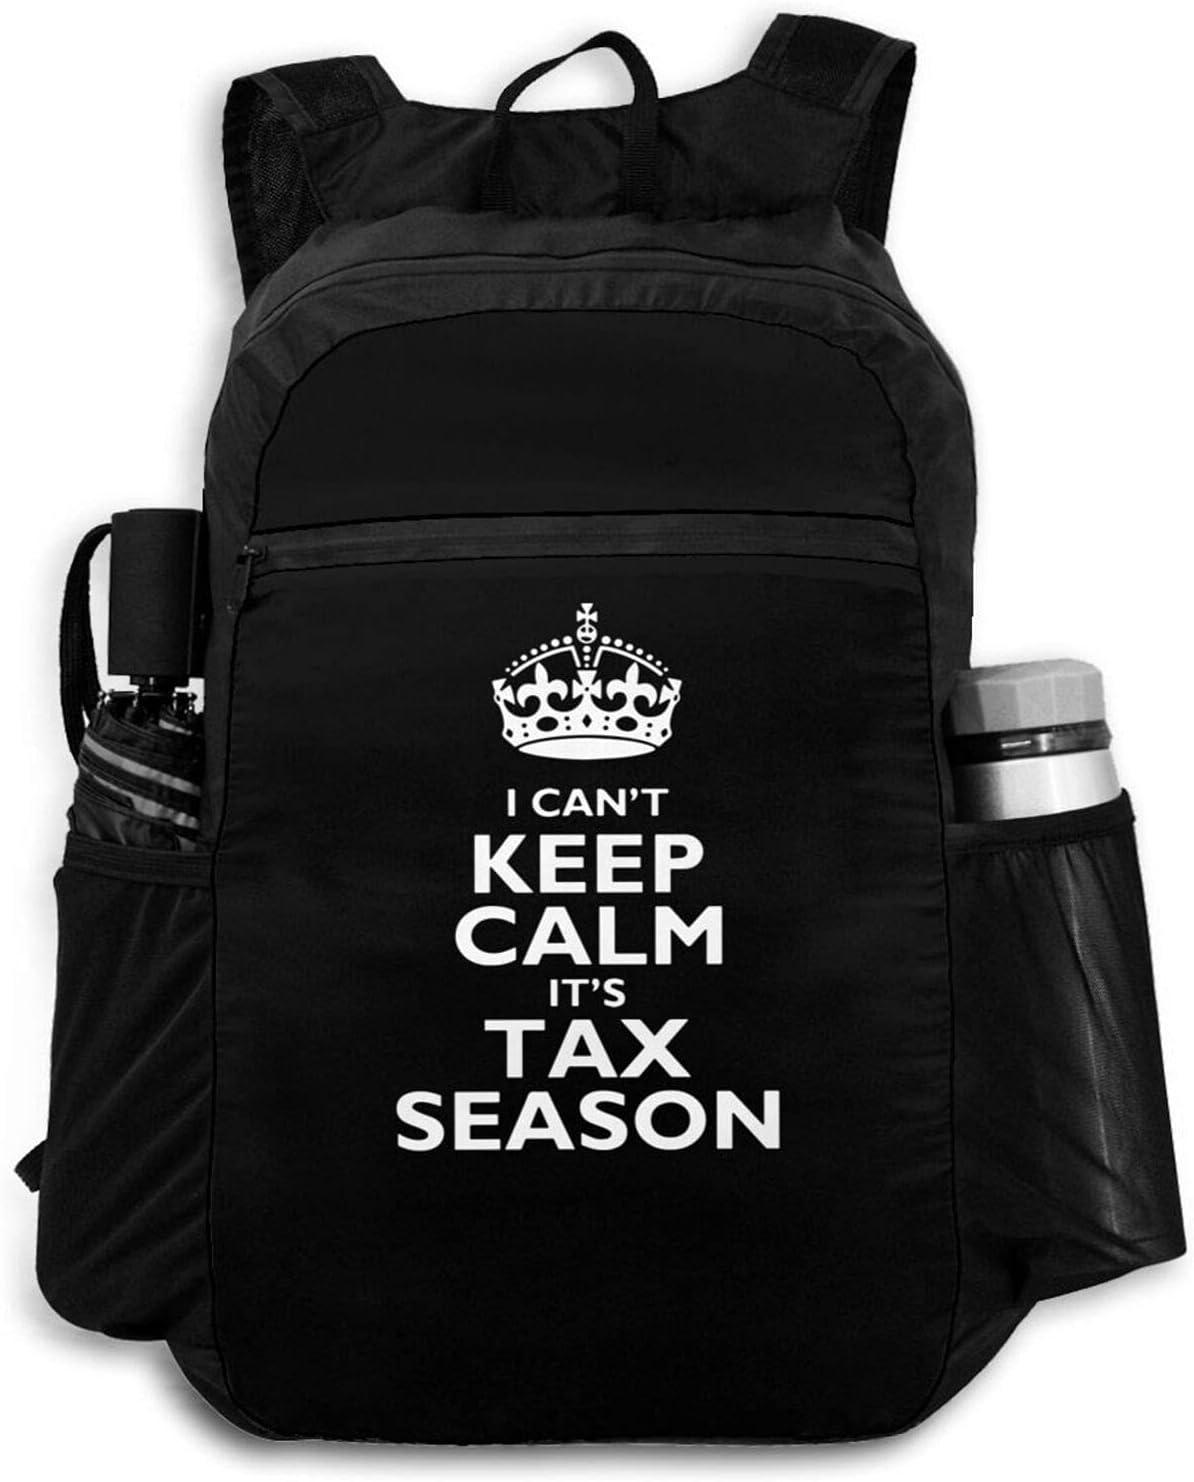 Zolama Can't Keep Calm Tax Season Women Men High quality new P Cute for Backpacks 5 ☆ popular